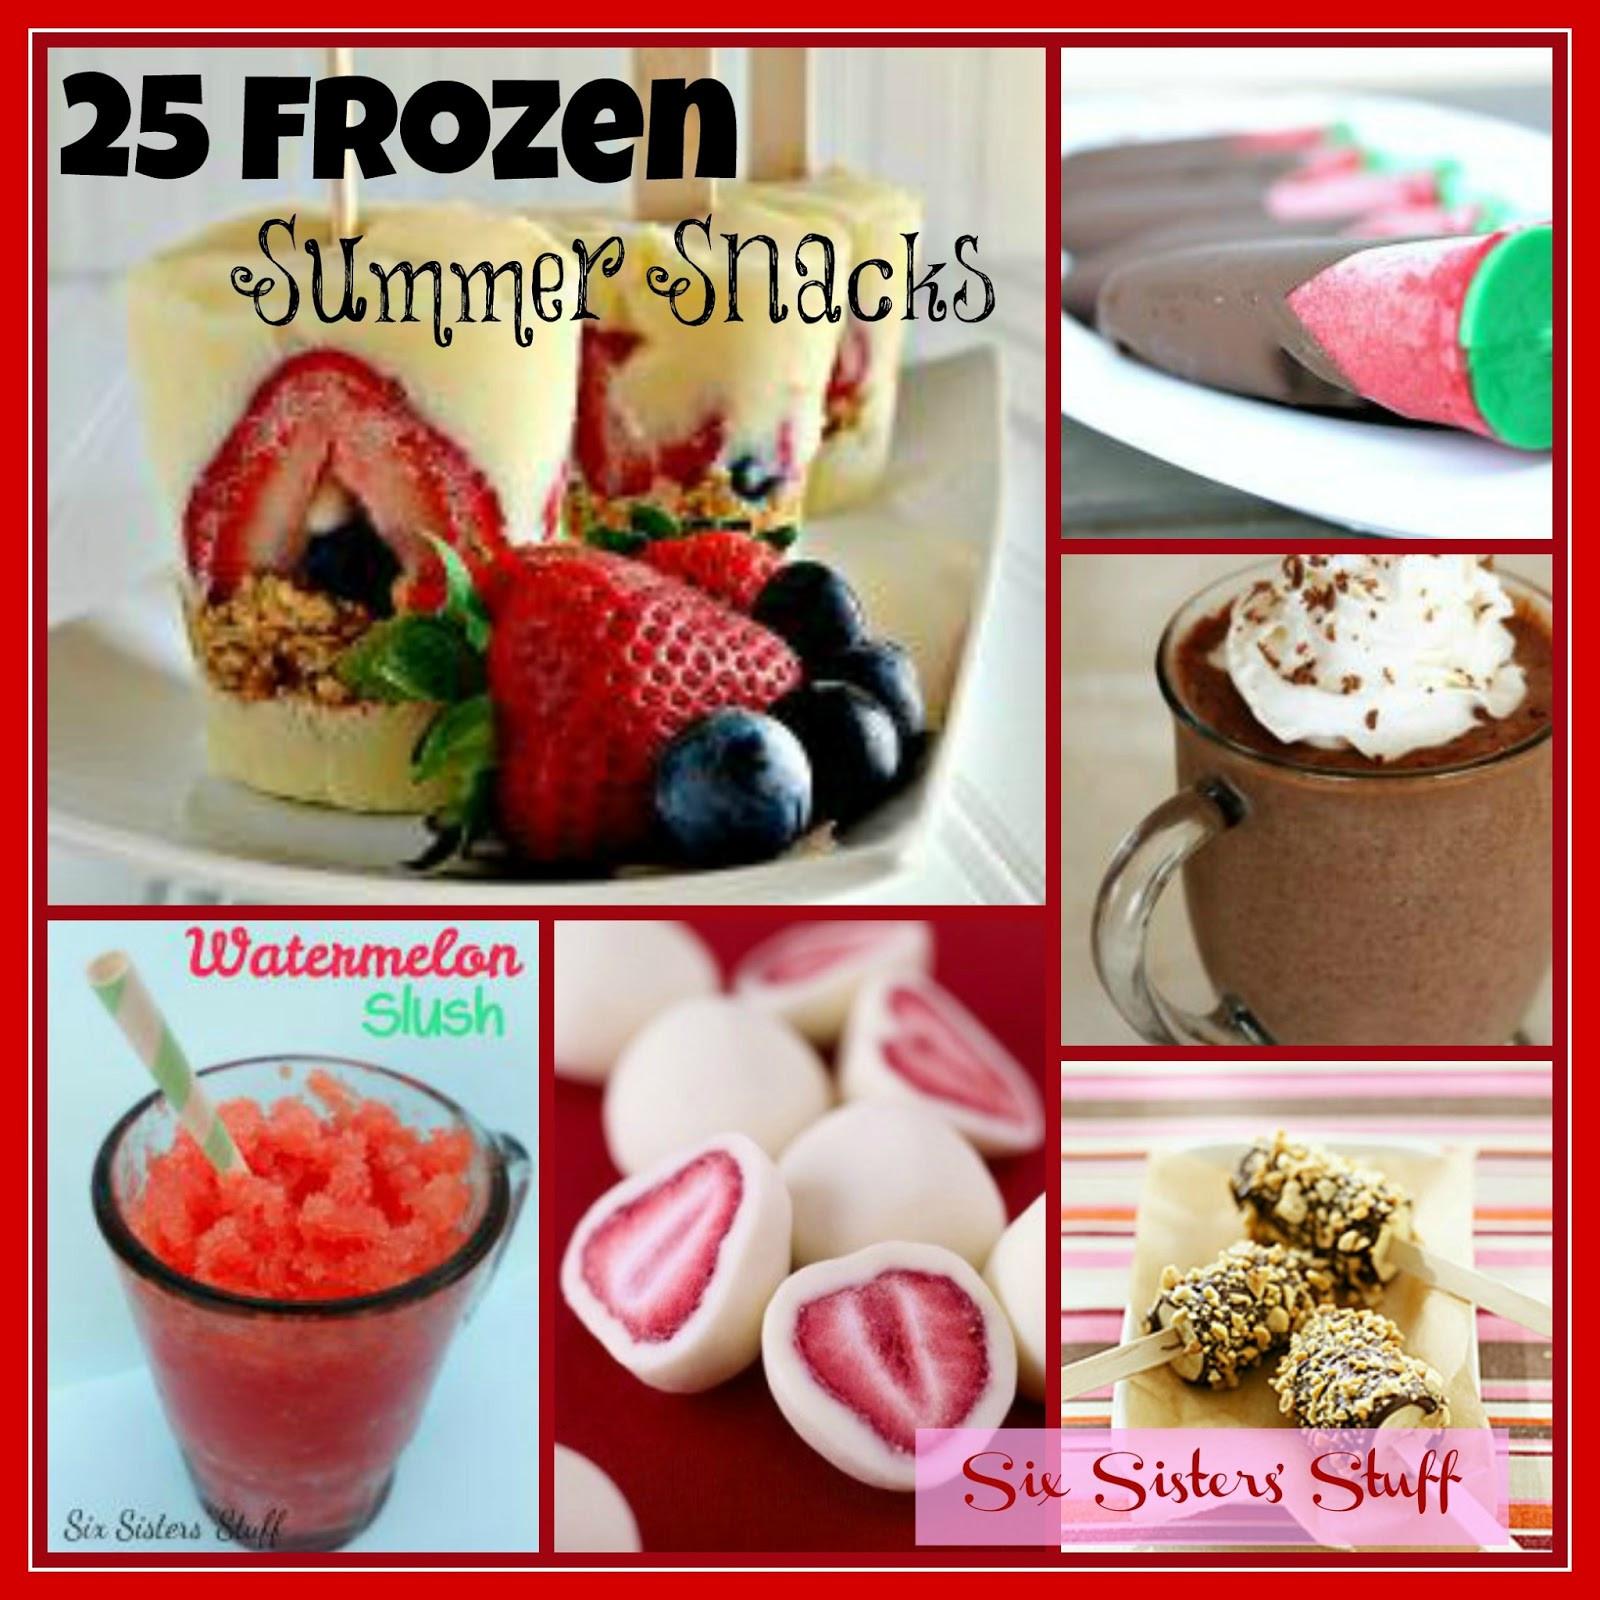 Summertime Snacks Recipe  25 Frozen Summer Snacks